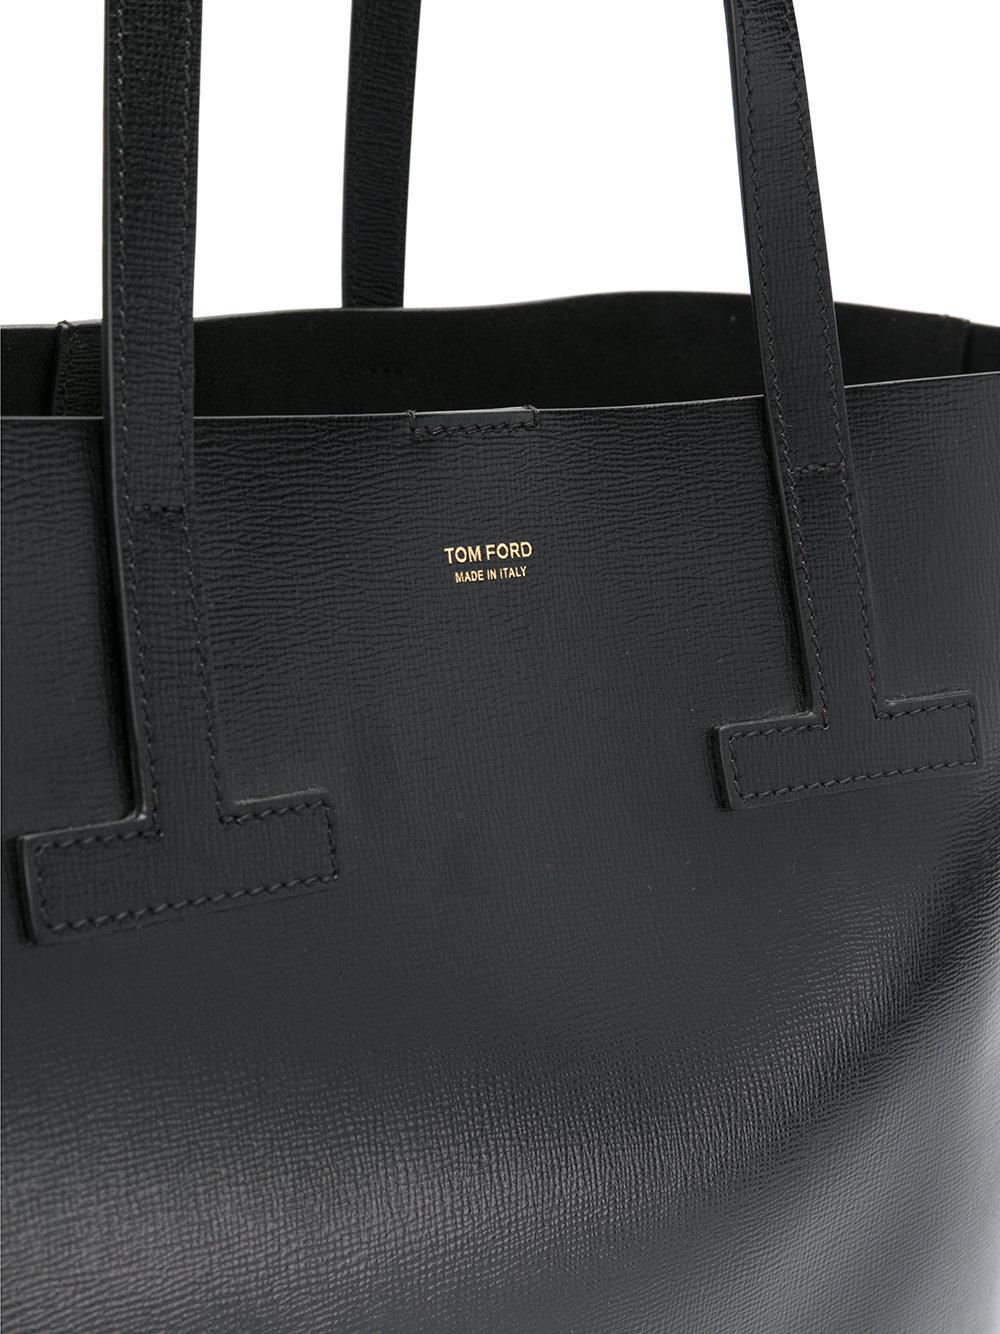 Tom Ford Leather Shopper Tote Bag in Black